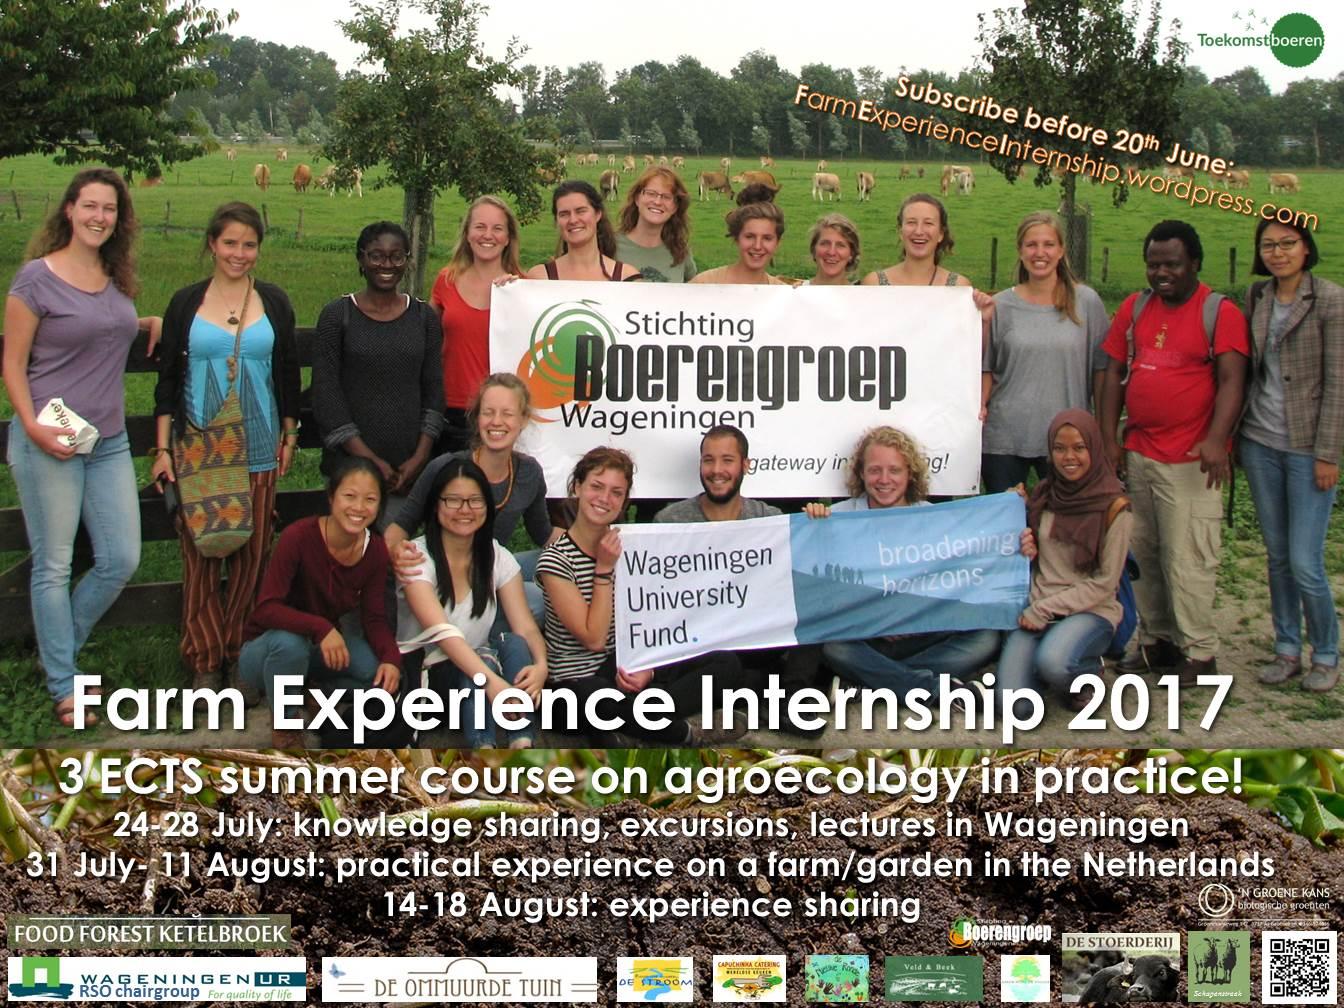 Farm Experience Internship 2017